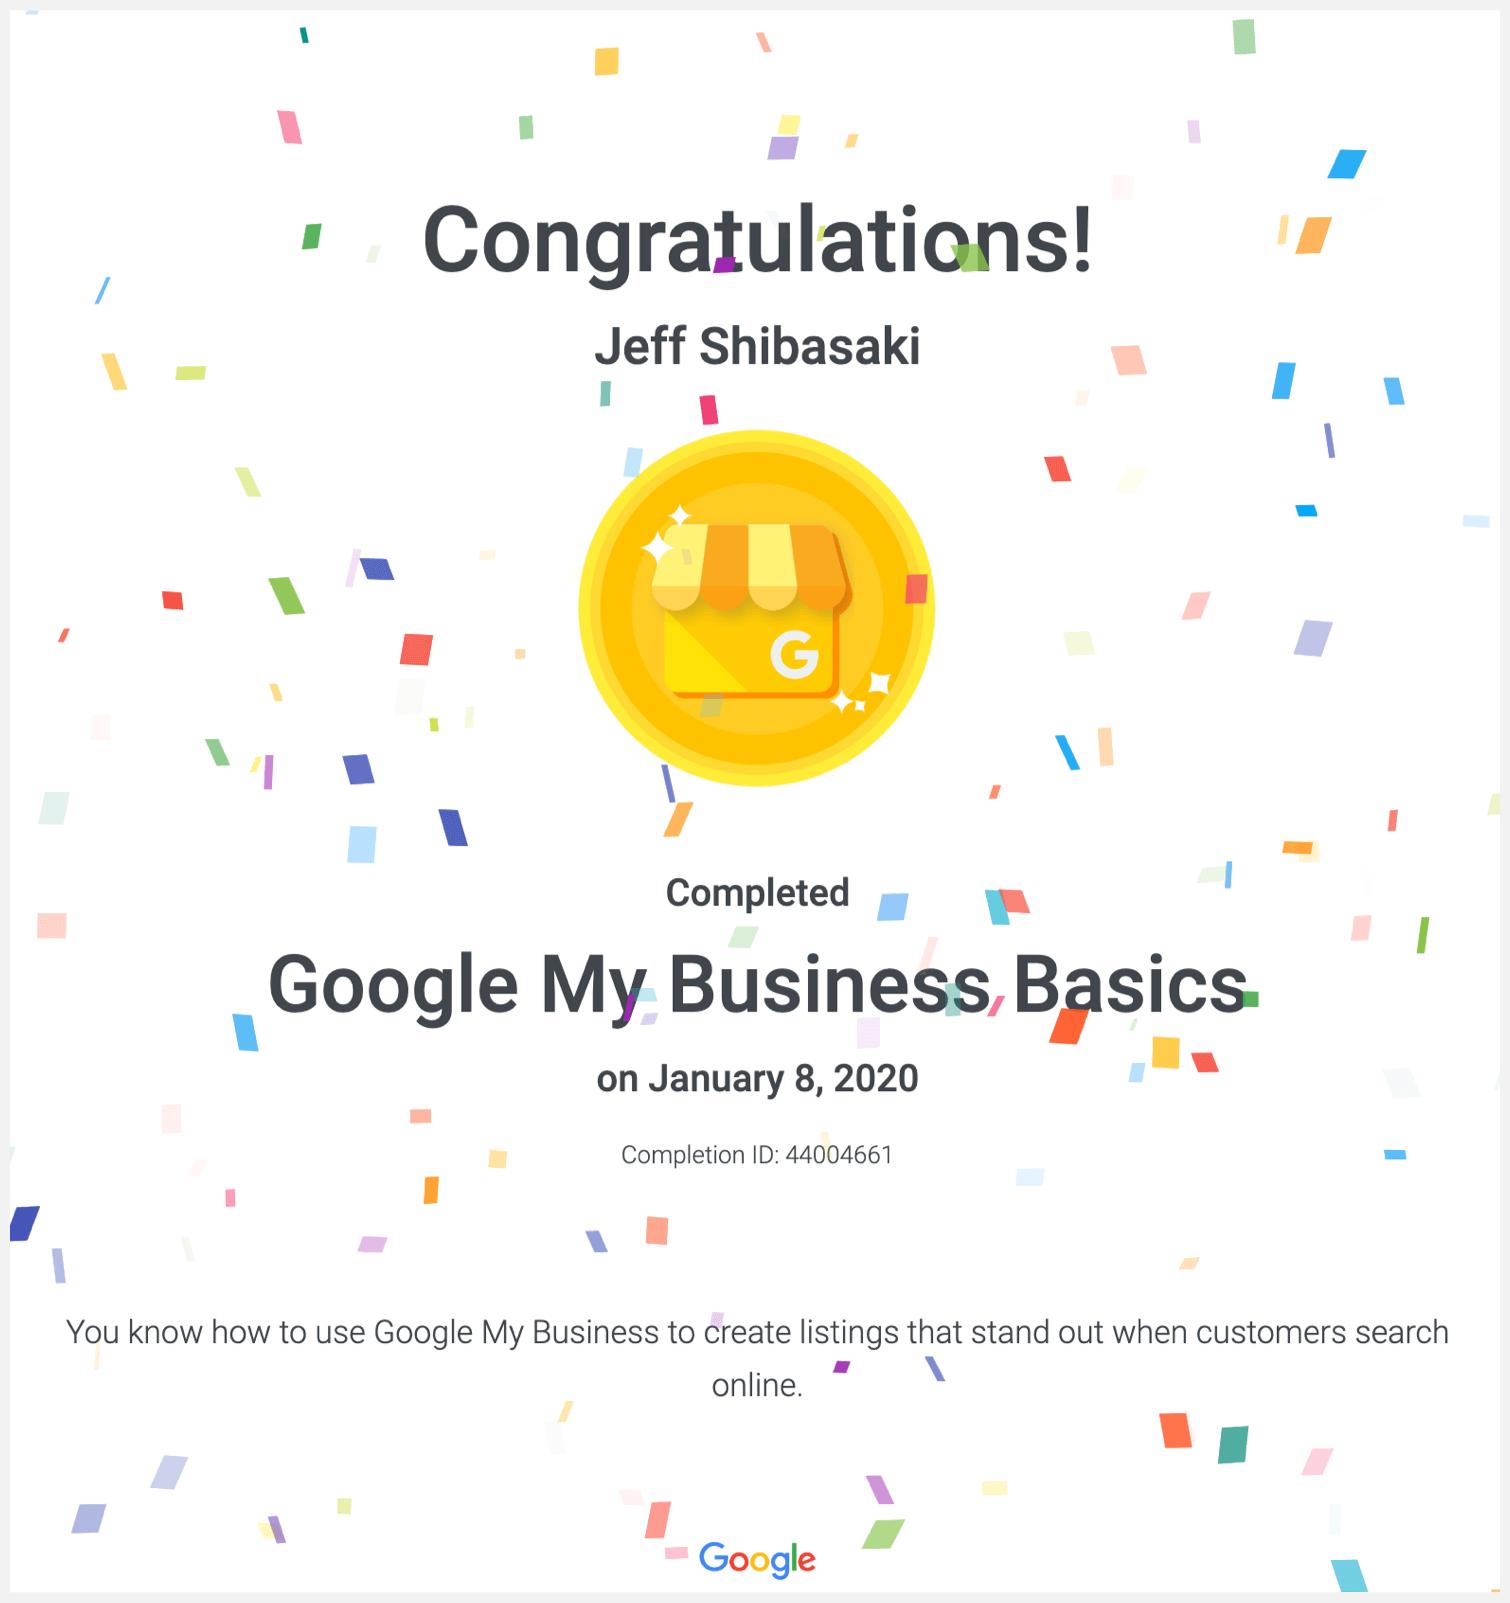 Google My Business Basics course certificate.